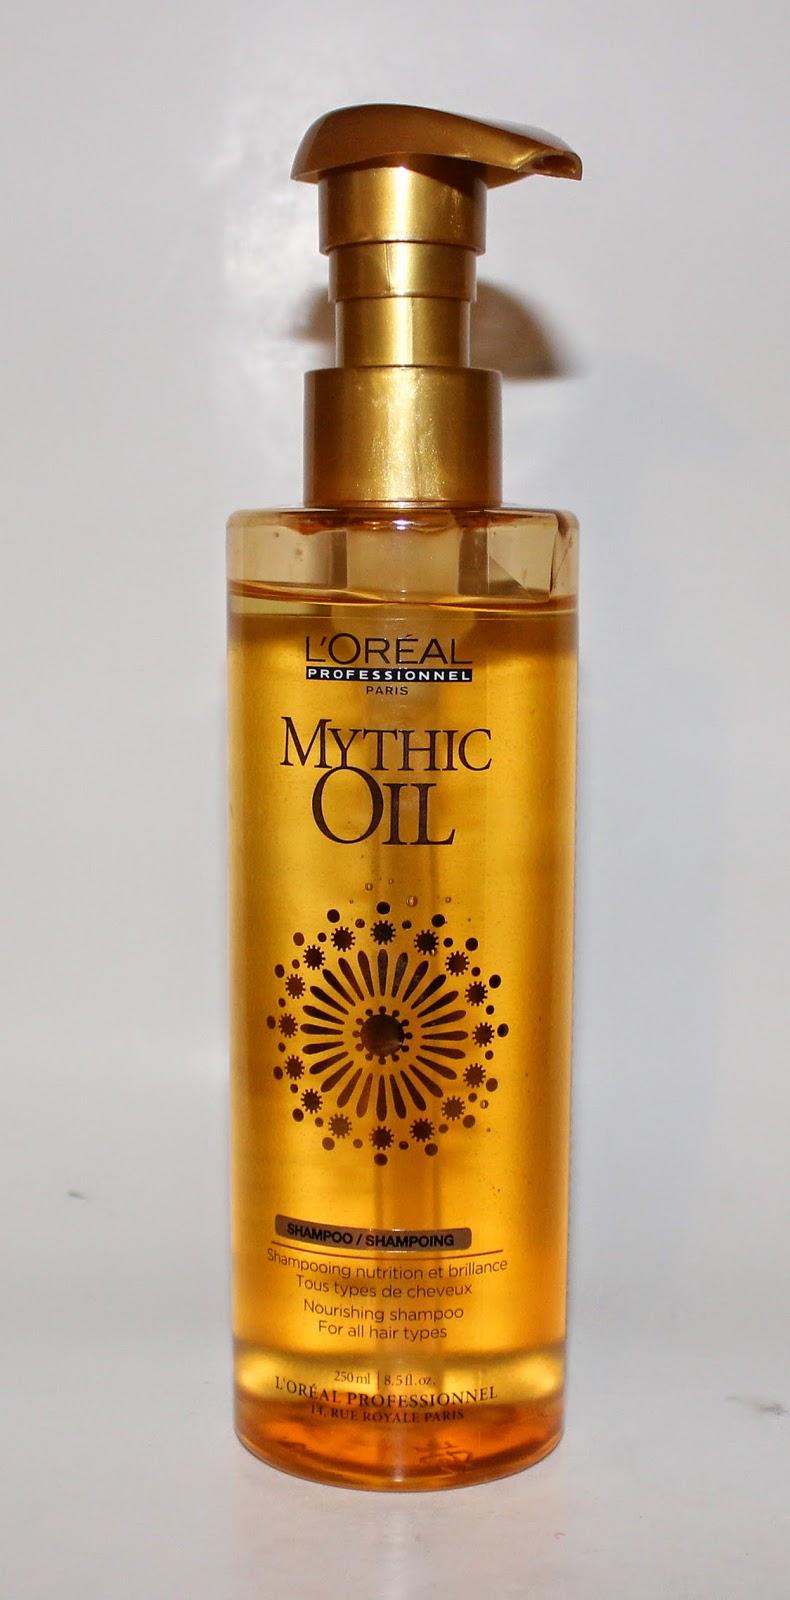 L'Oréal Professional Mythic Oil Nourishing Shampoo